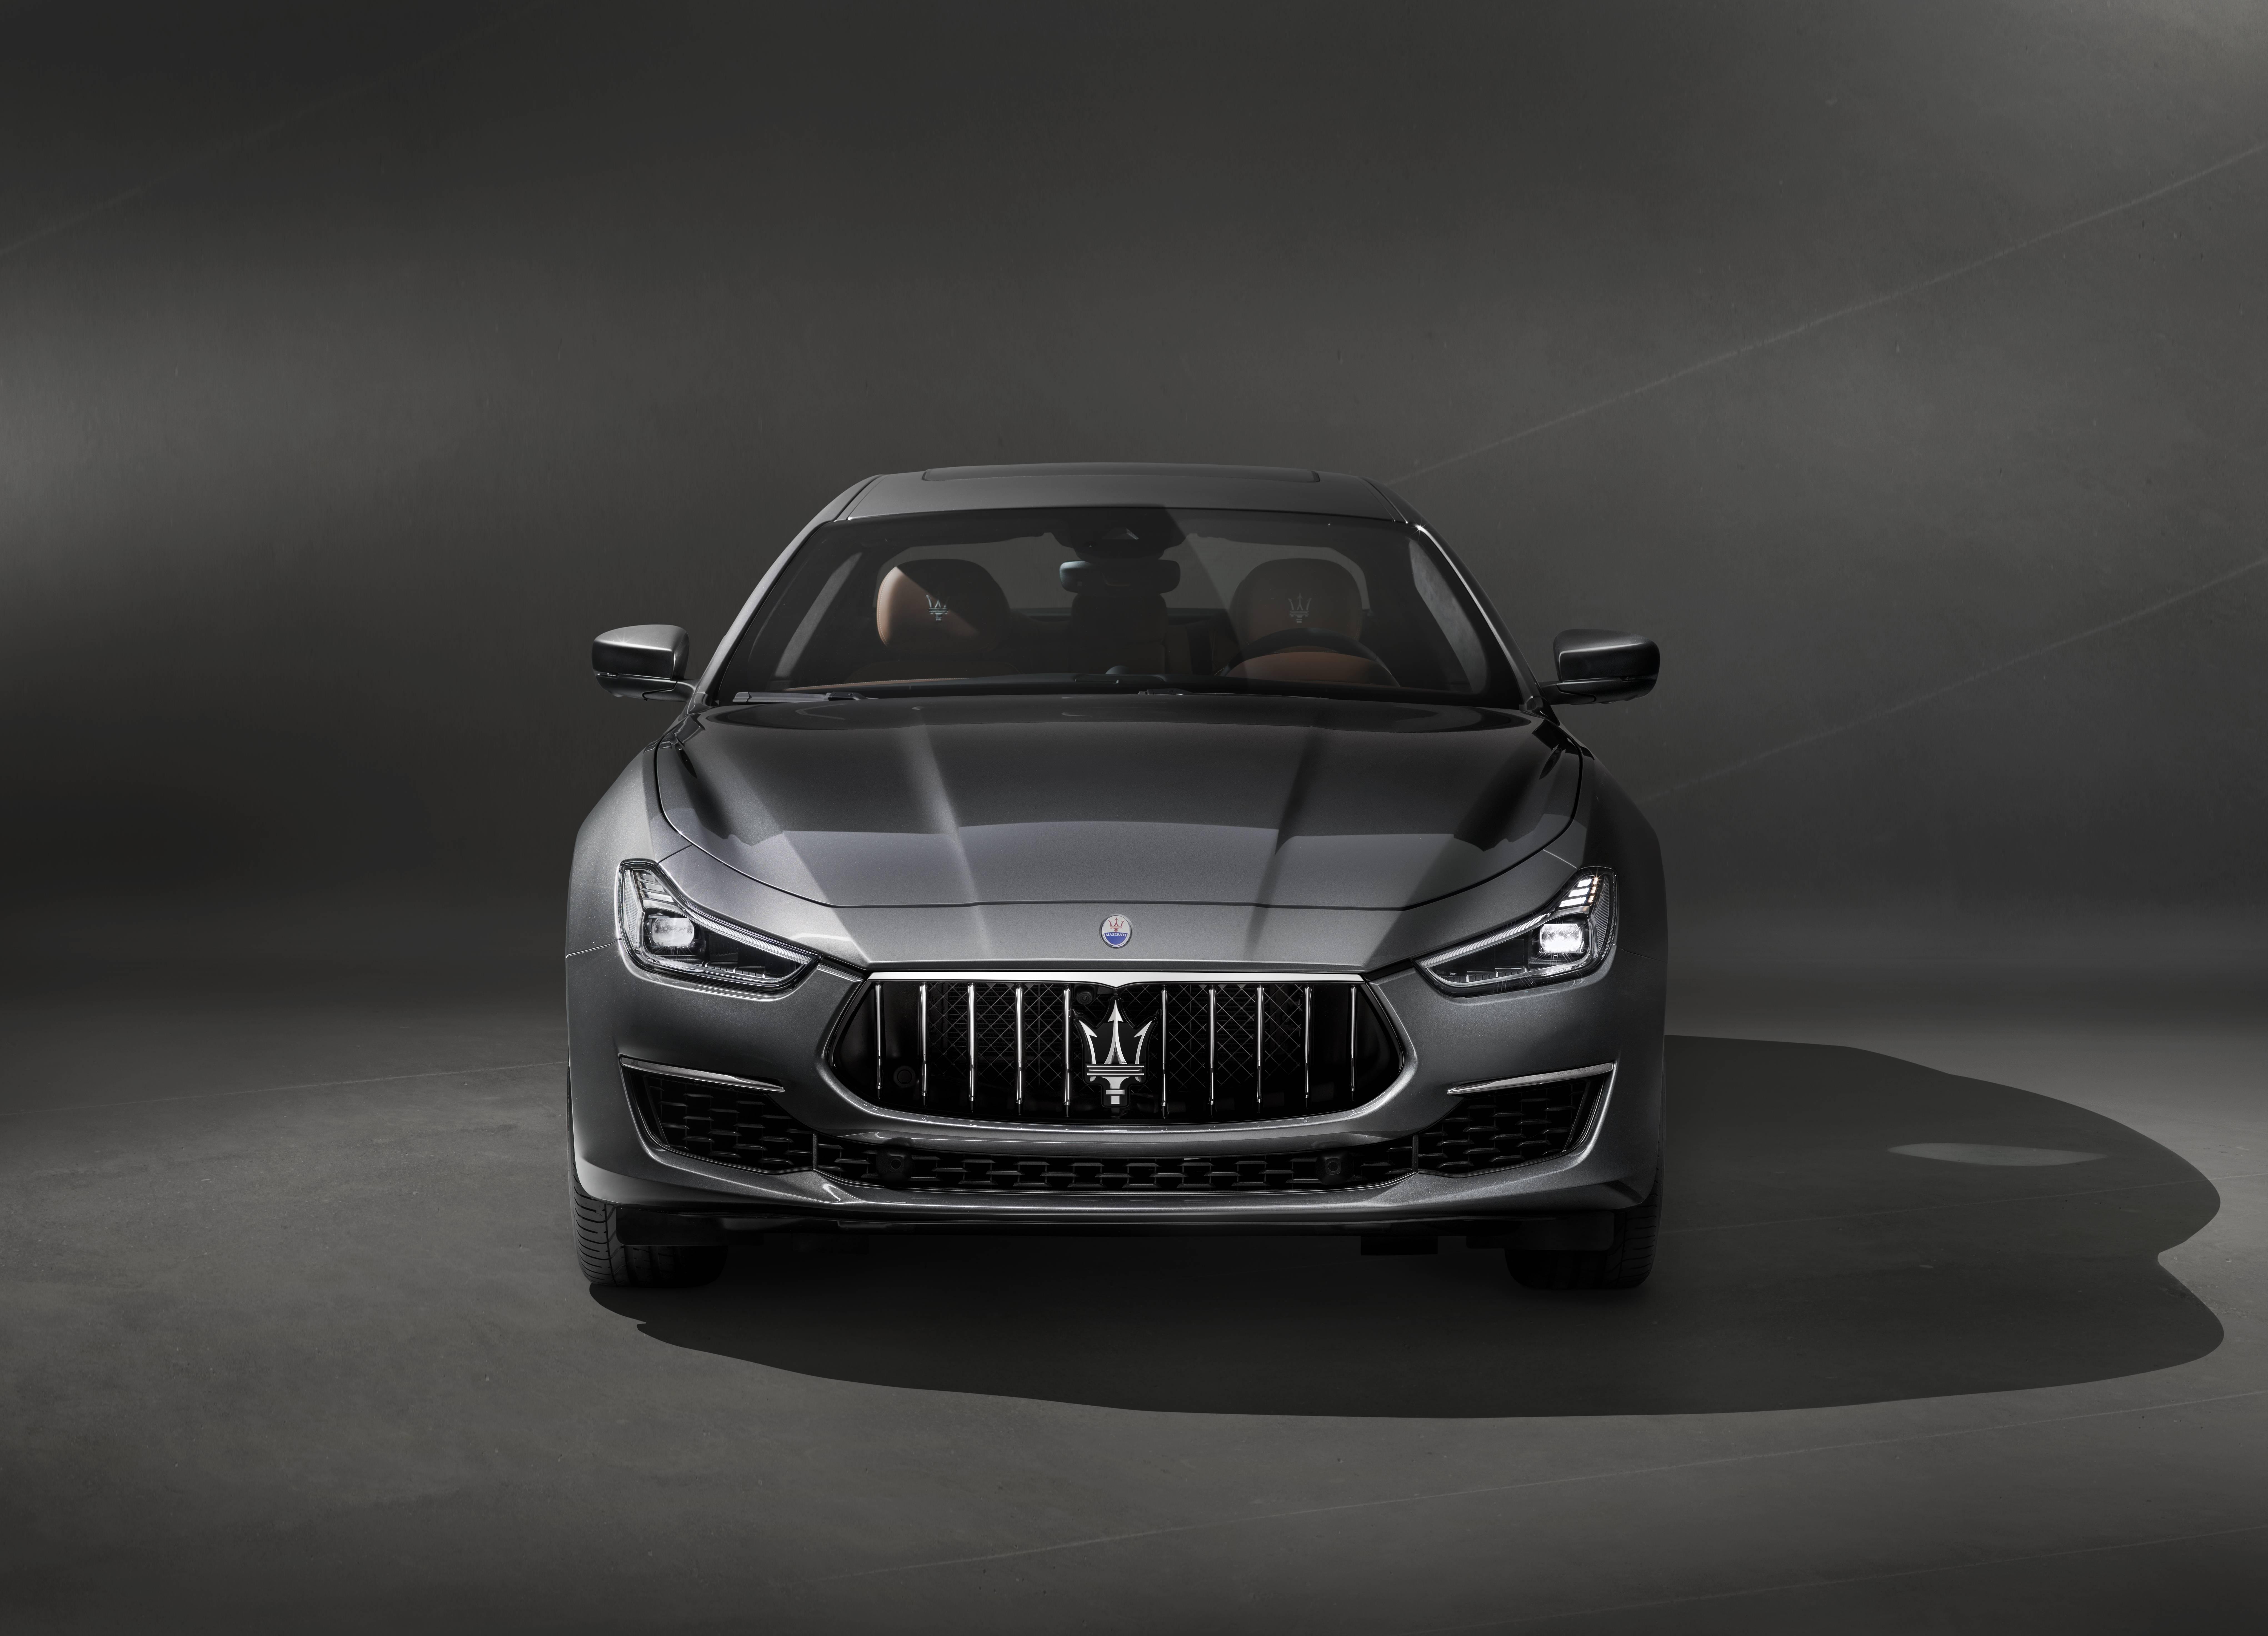 2018 Maserati Ghibli Makes Its Debut In Malaysia – Piston.my